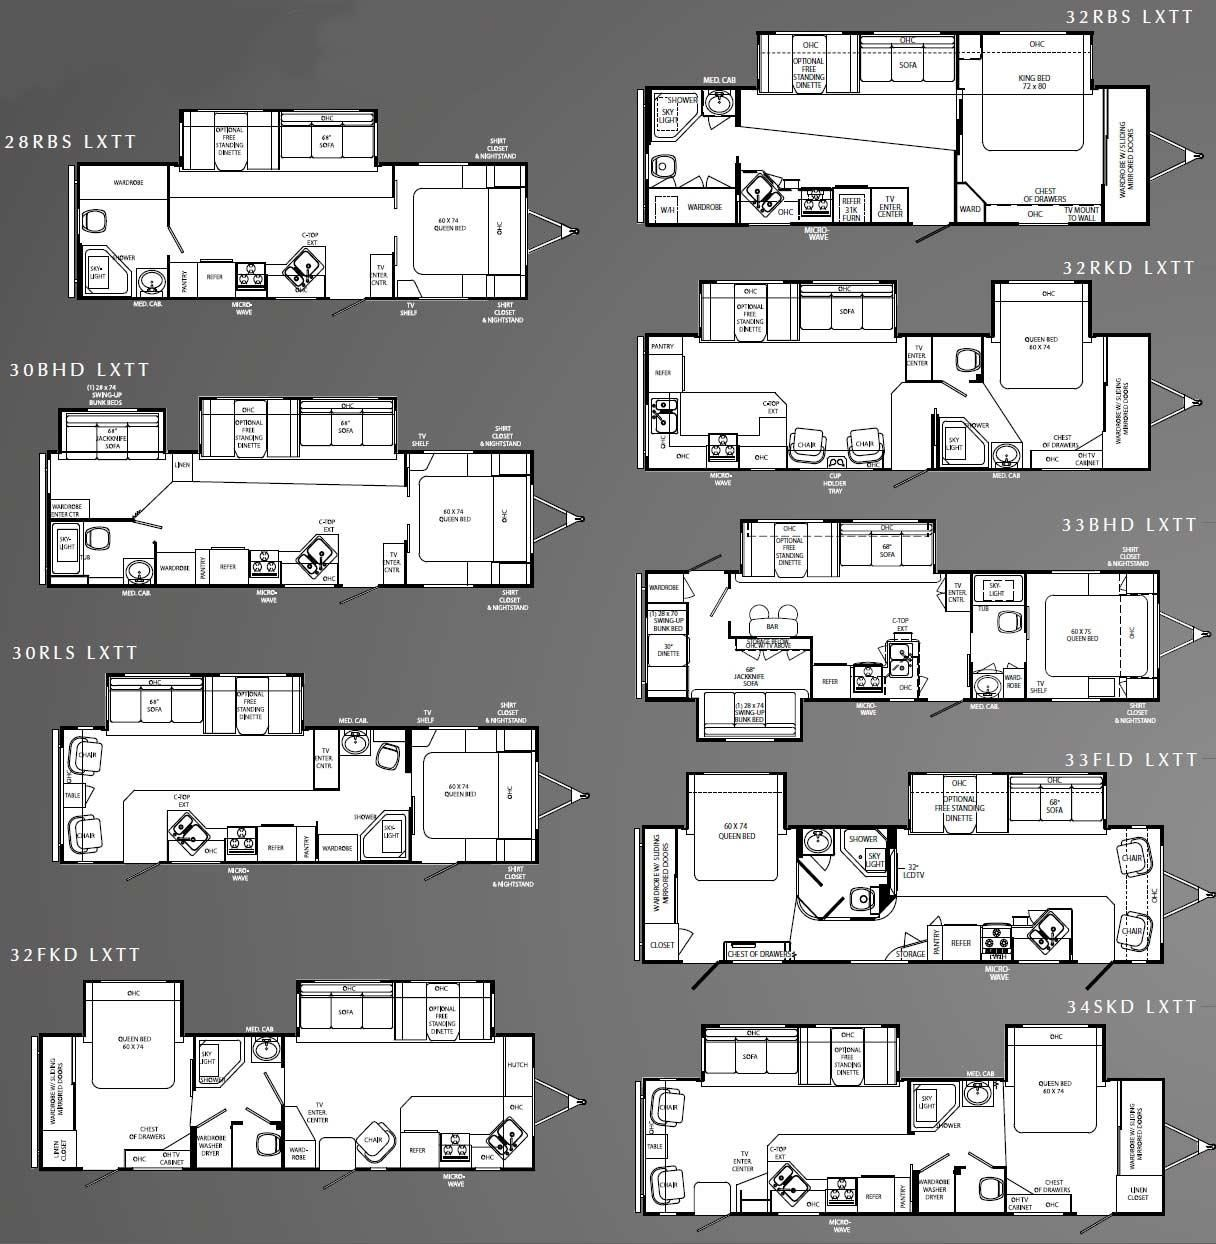 Travel Trailer Floor Plans Under 30 Feet